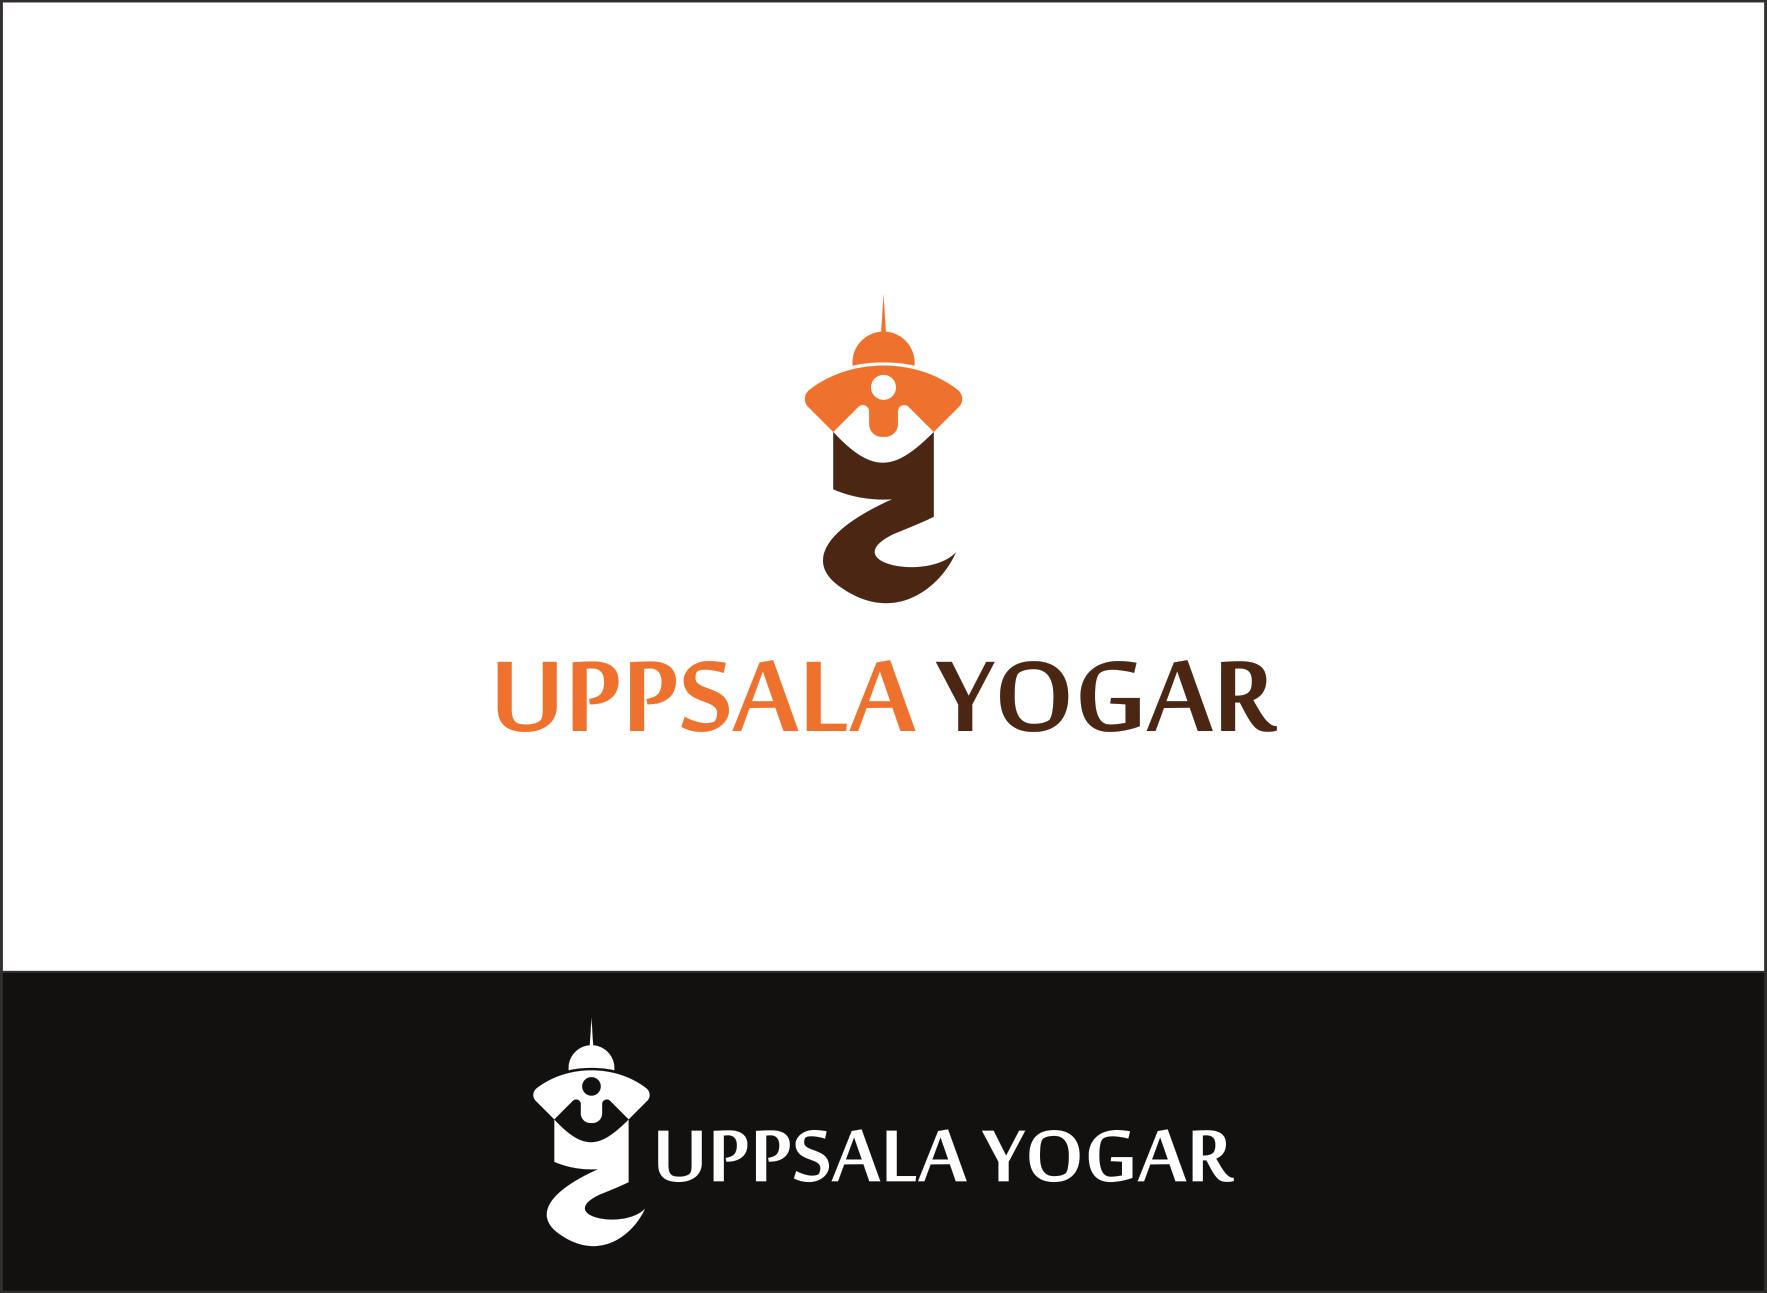 Logo Design by Armada Jamaluddin - Entry No. 65 in the Logo Design Contest Unique Logo Design Wanted for Uppsala Yogar.